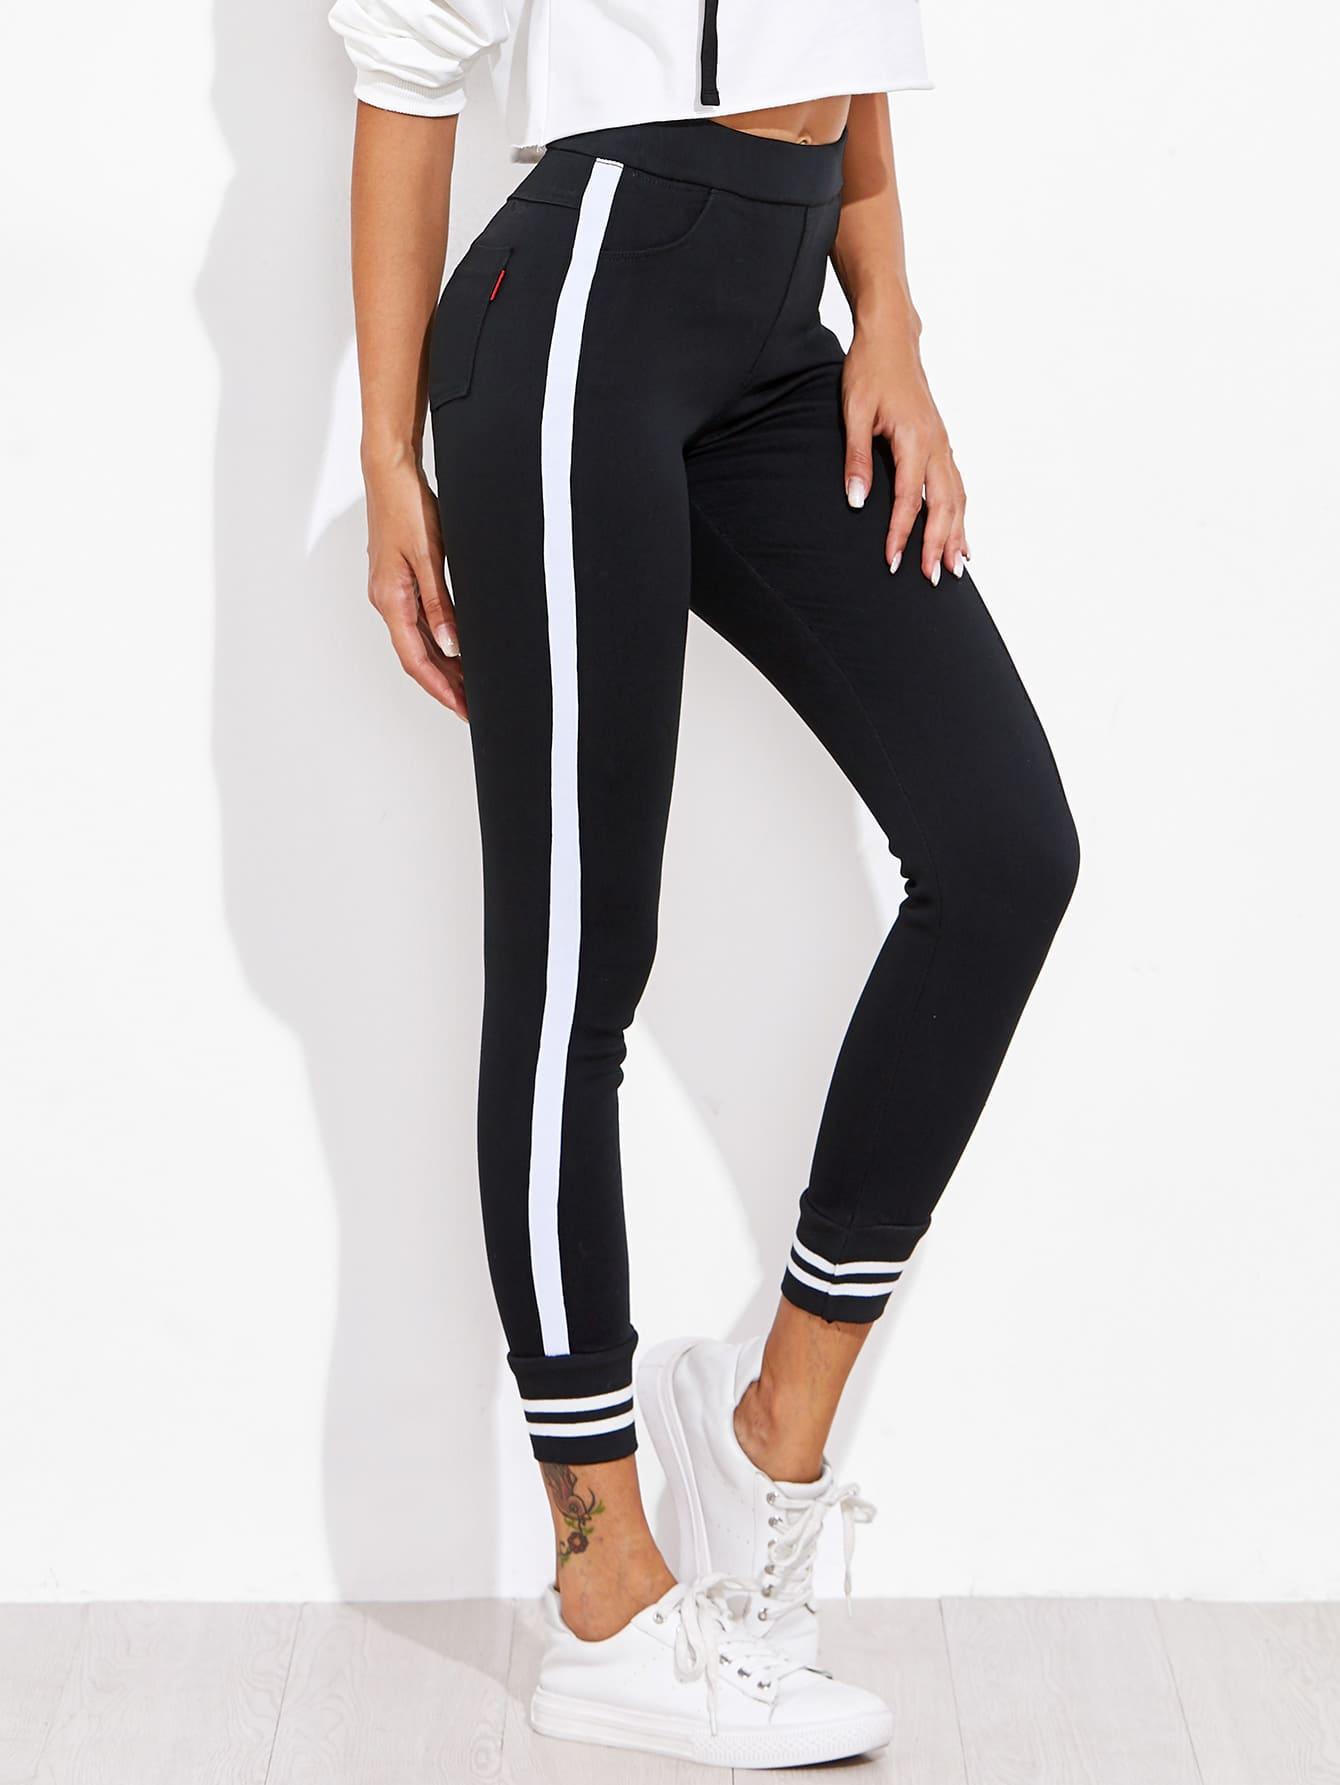 Image of Contrast Striped Sport Leggings Pants